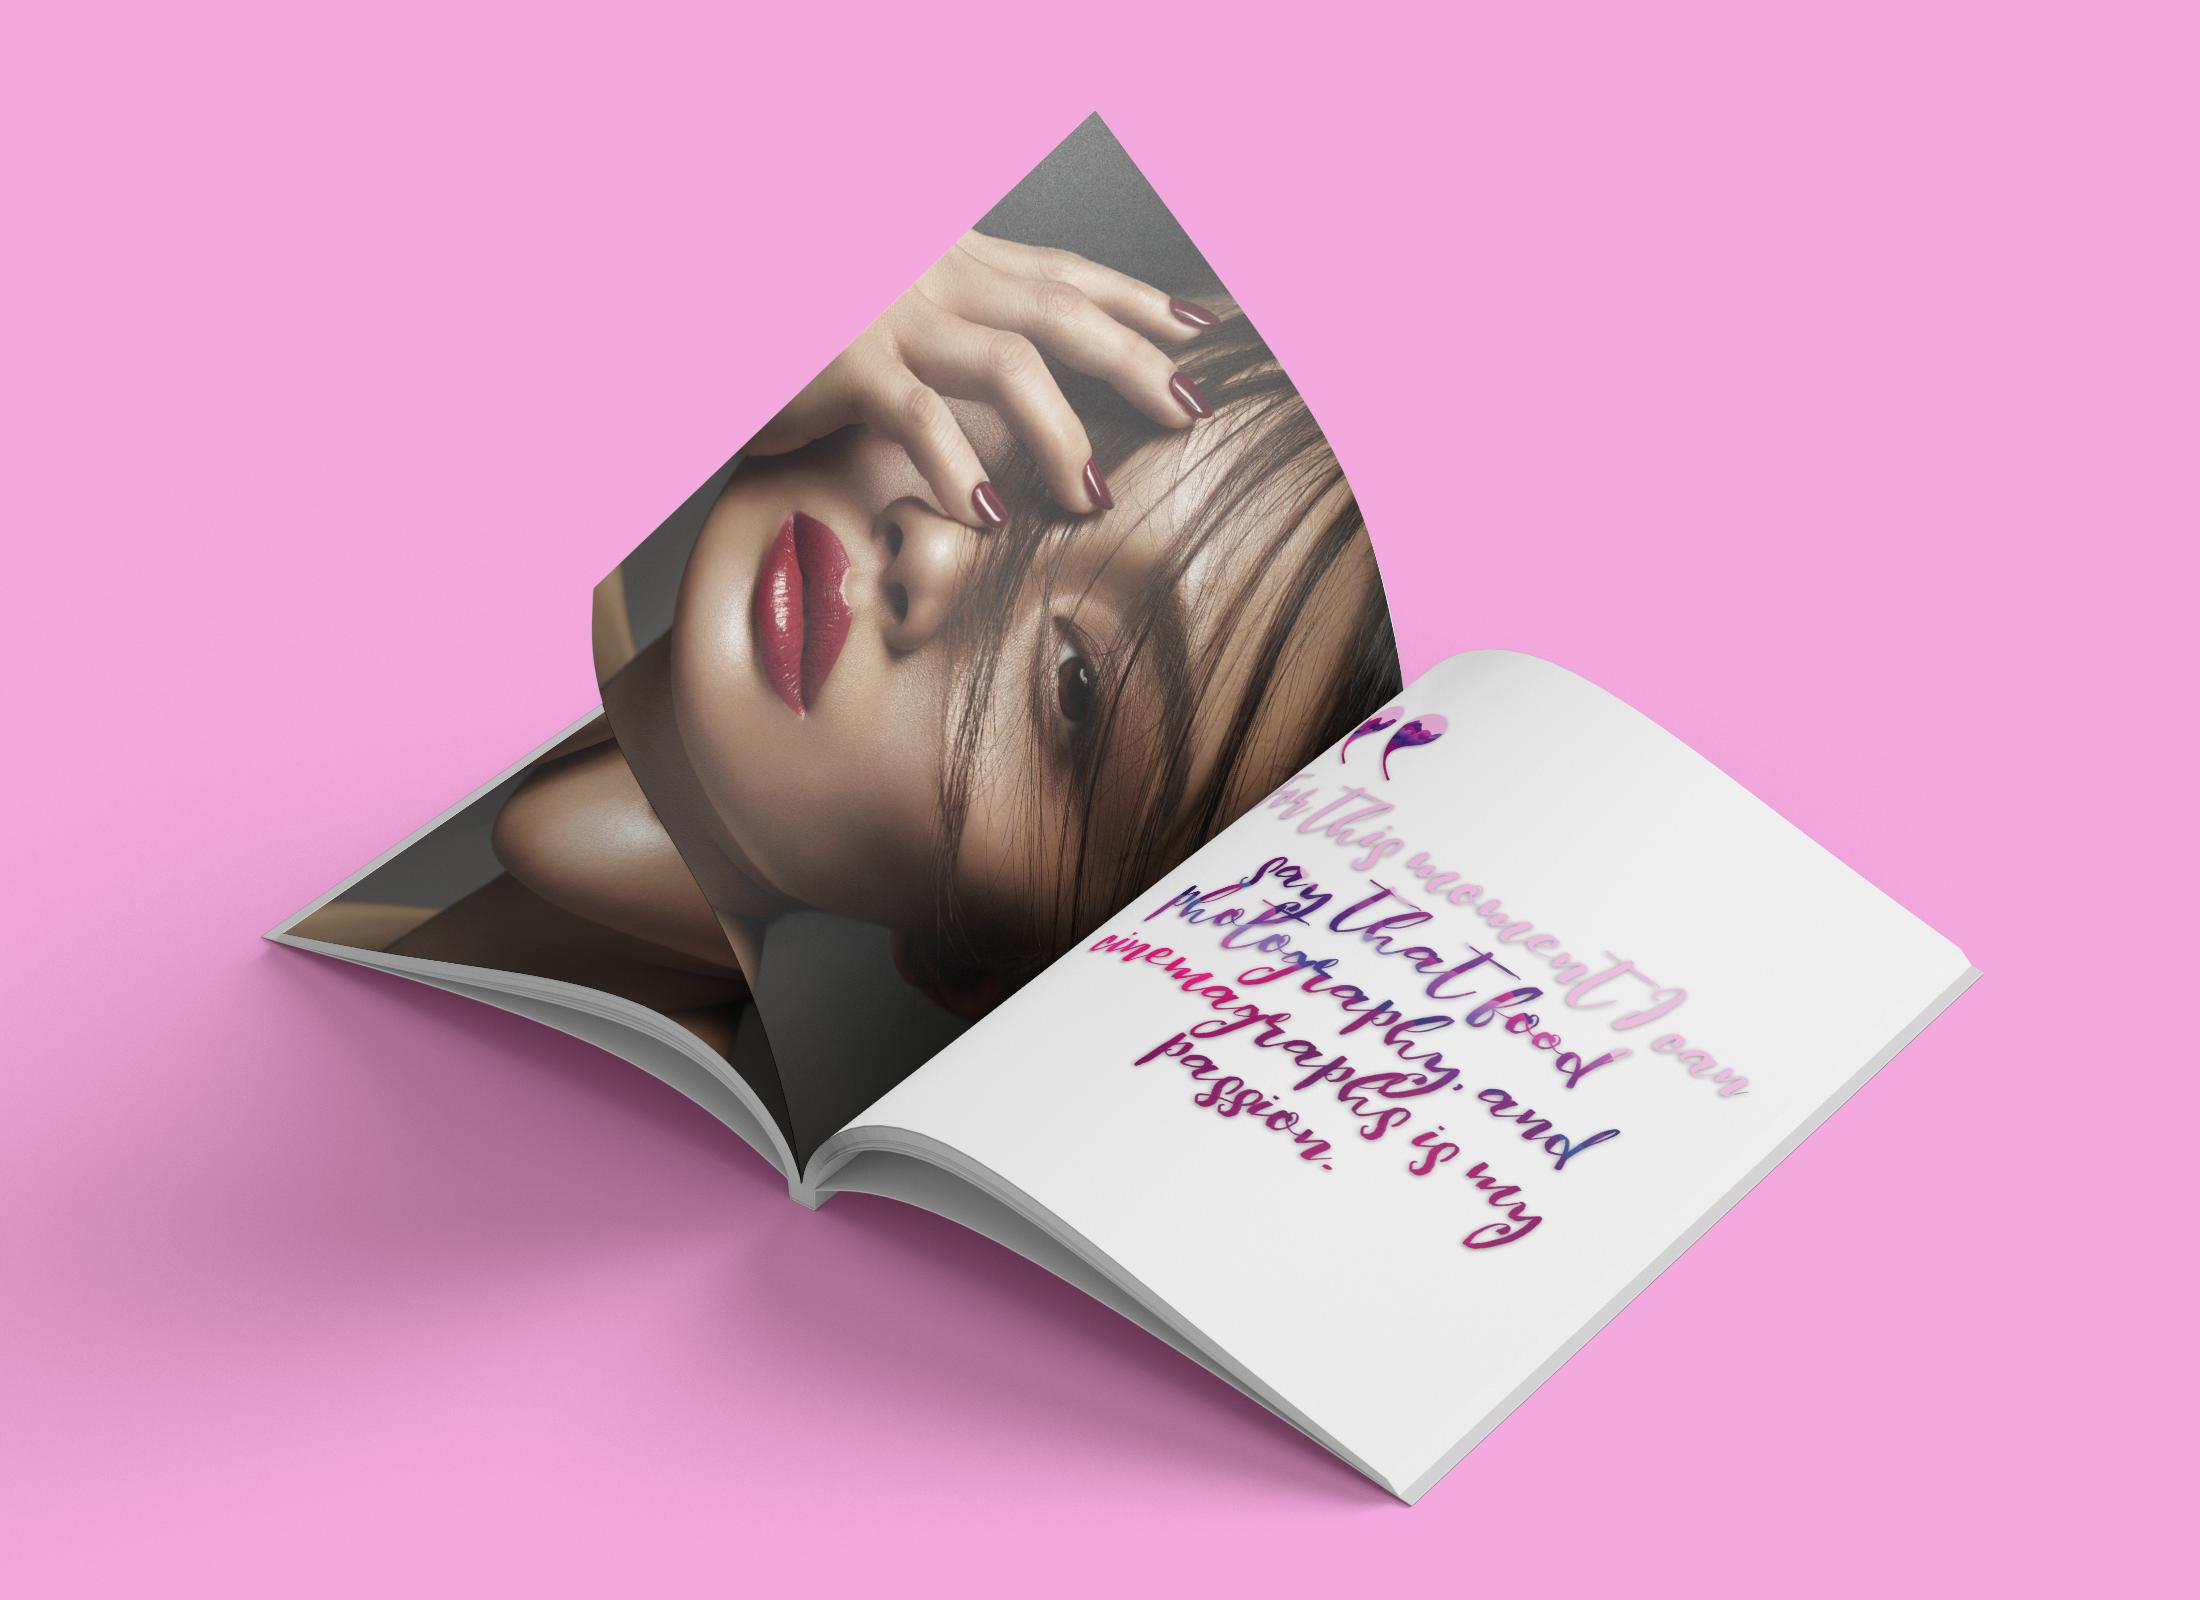 Model Citizen Magazine Issue 38, Macky Suson, Fashion Inclusion Now7.png